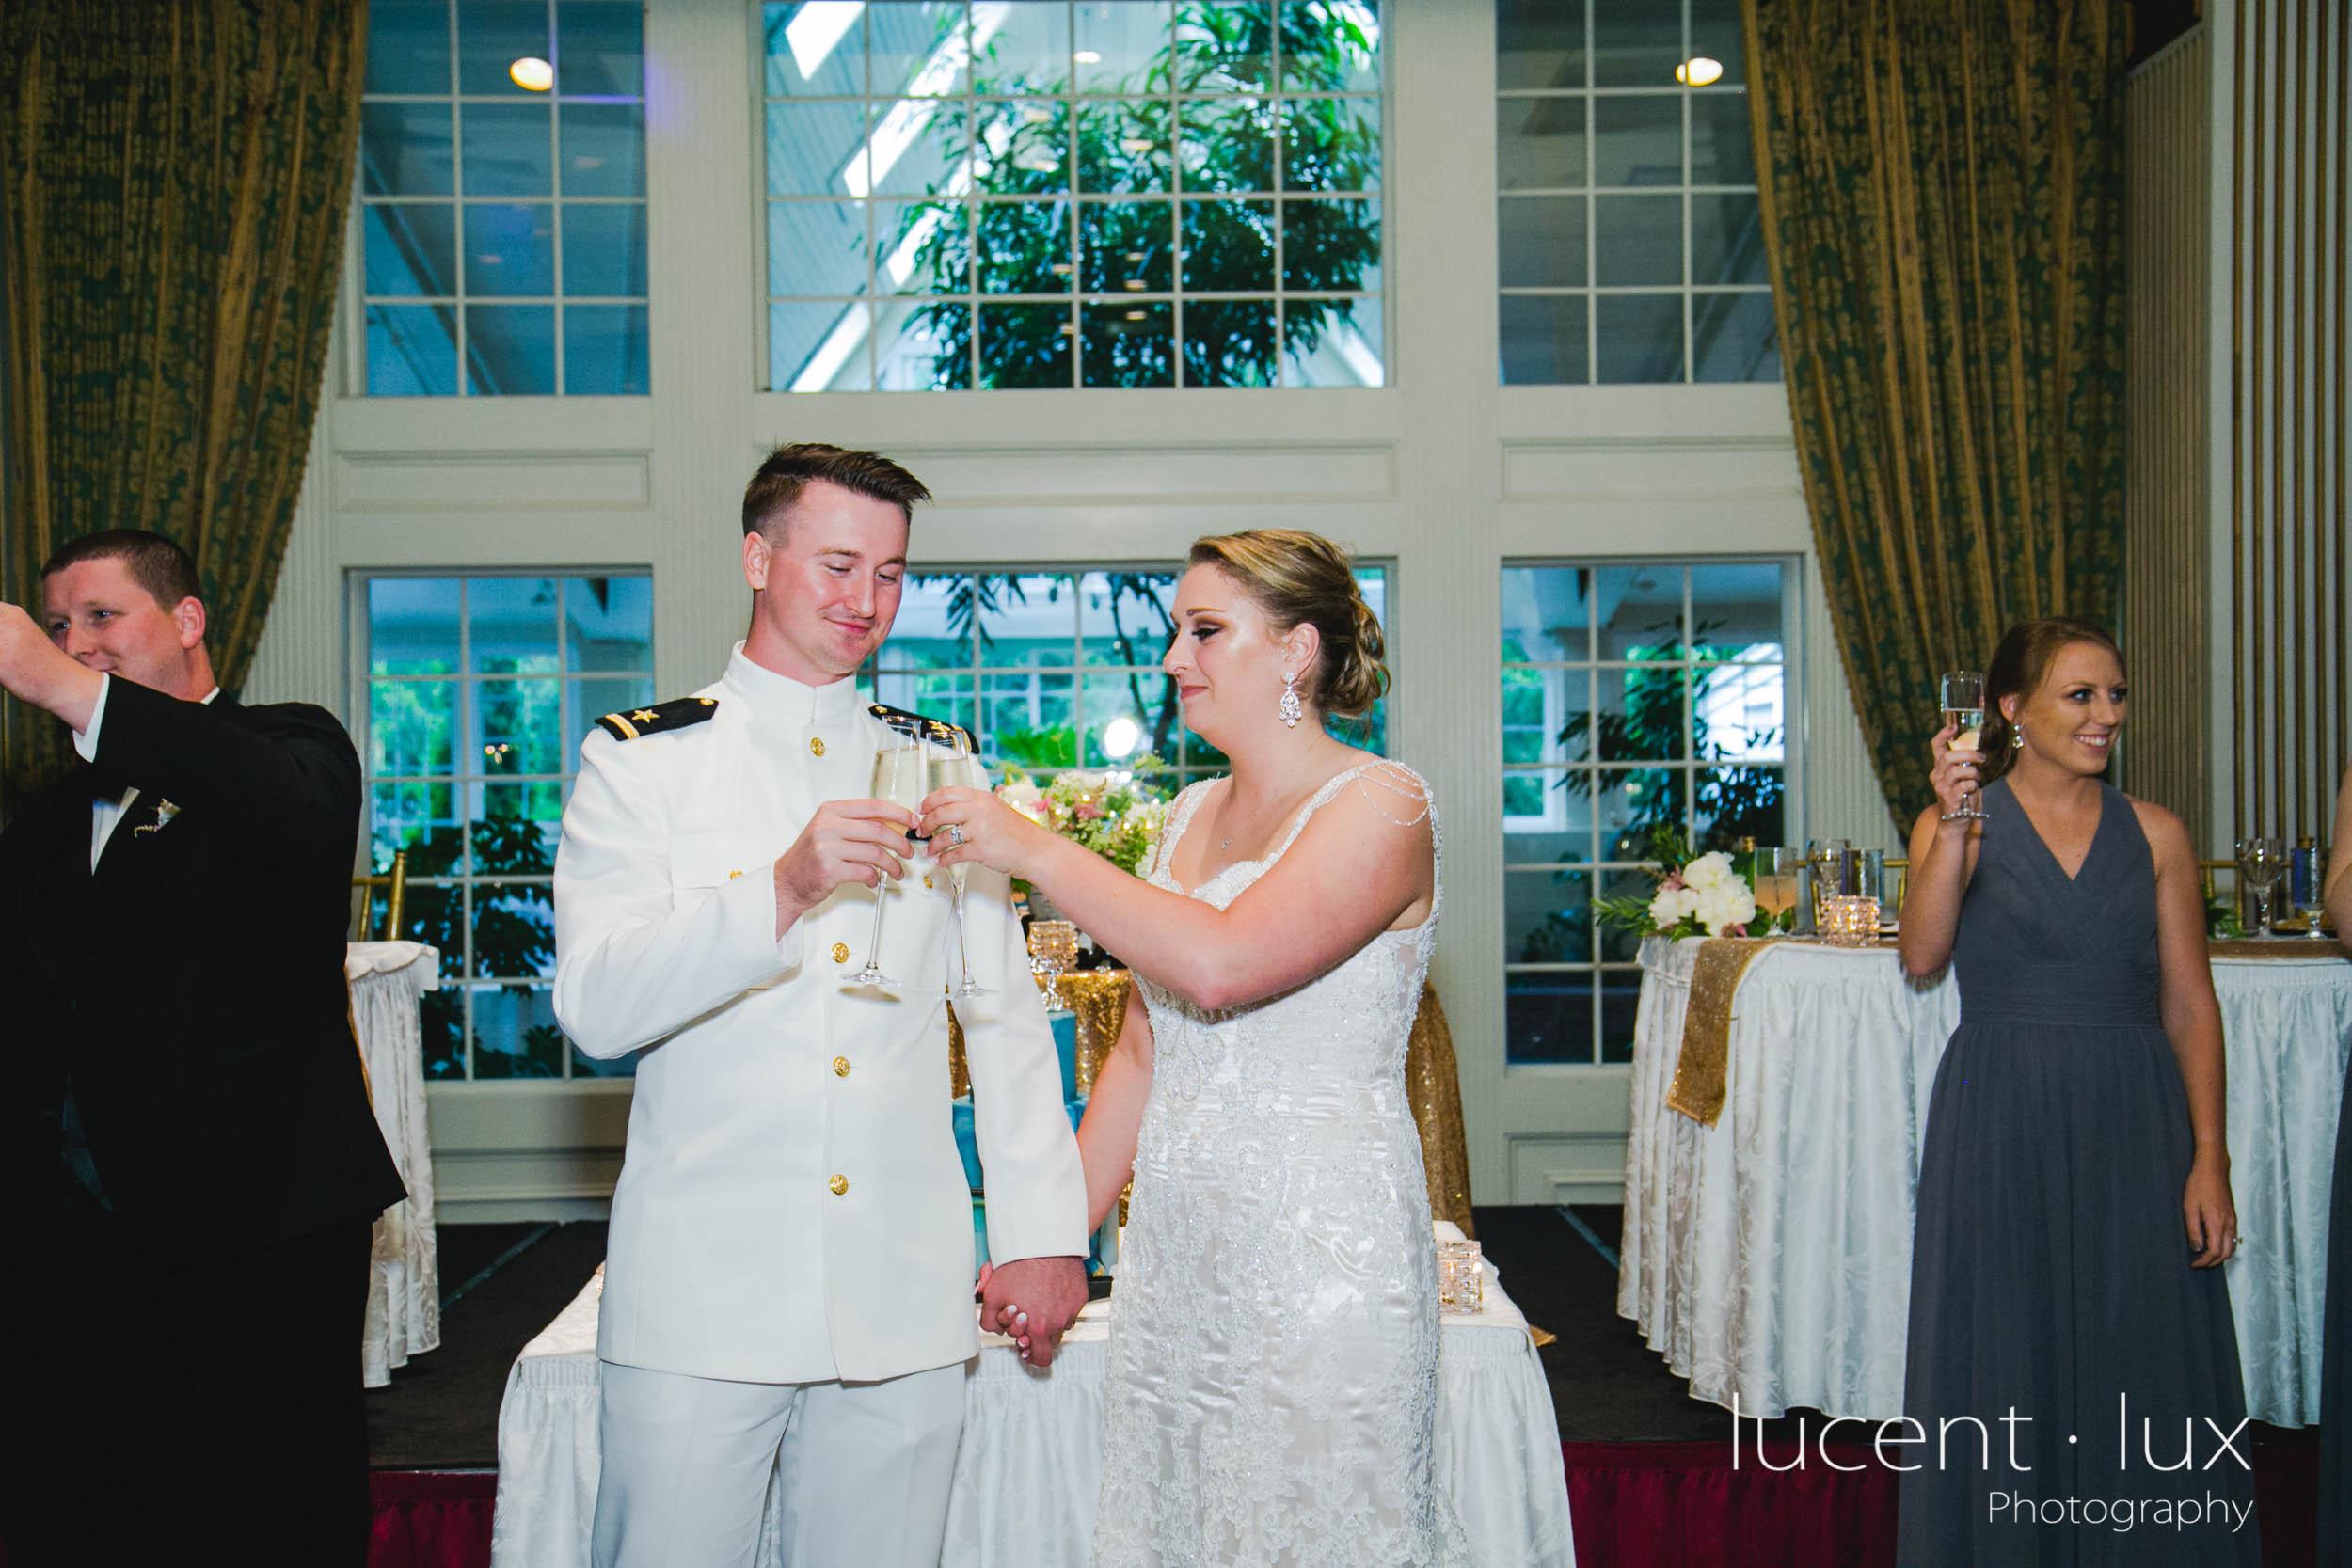 Wedding-Photography-Maryland-Pennsylvania-Photographer-Mendenhall-Inn-Media-Portrait-Event-149.jpg